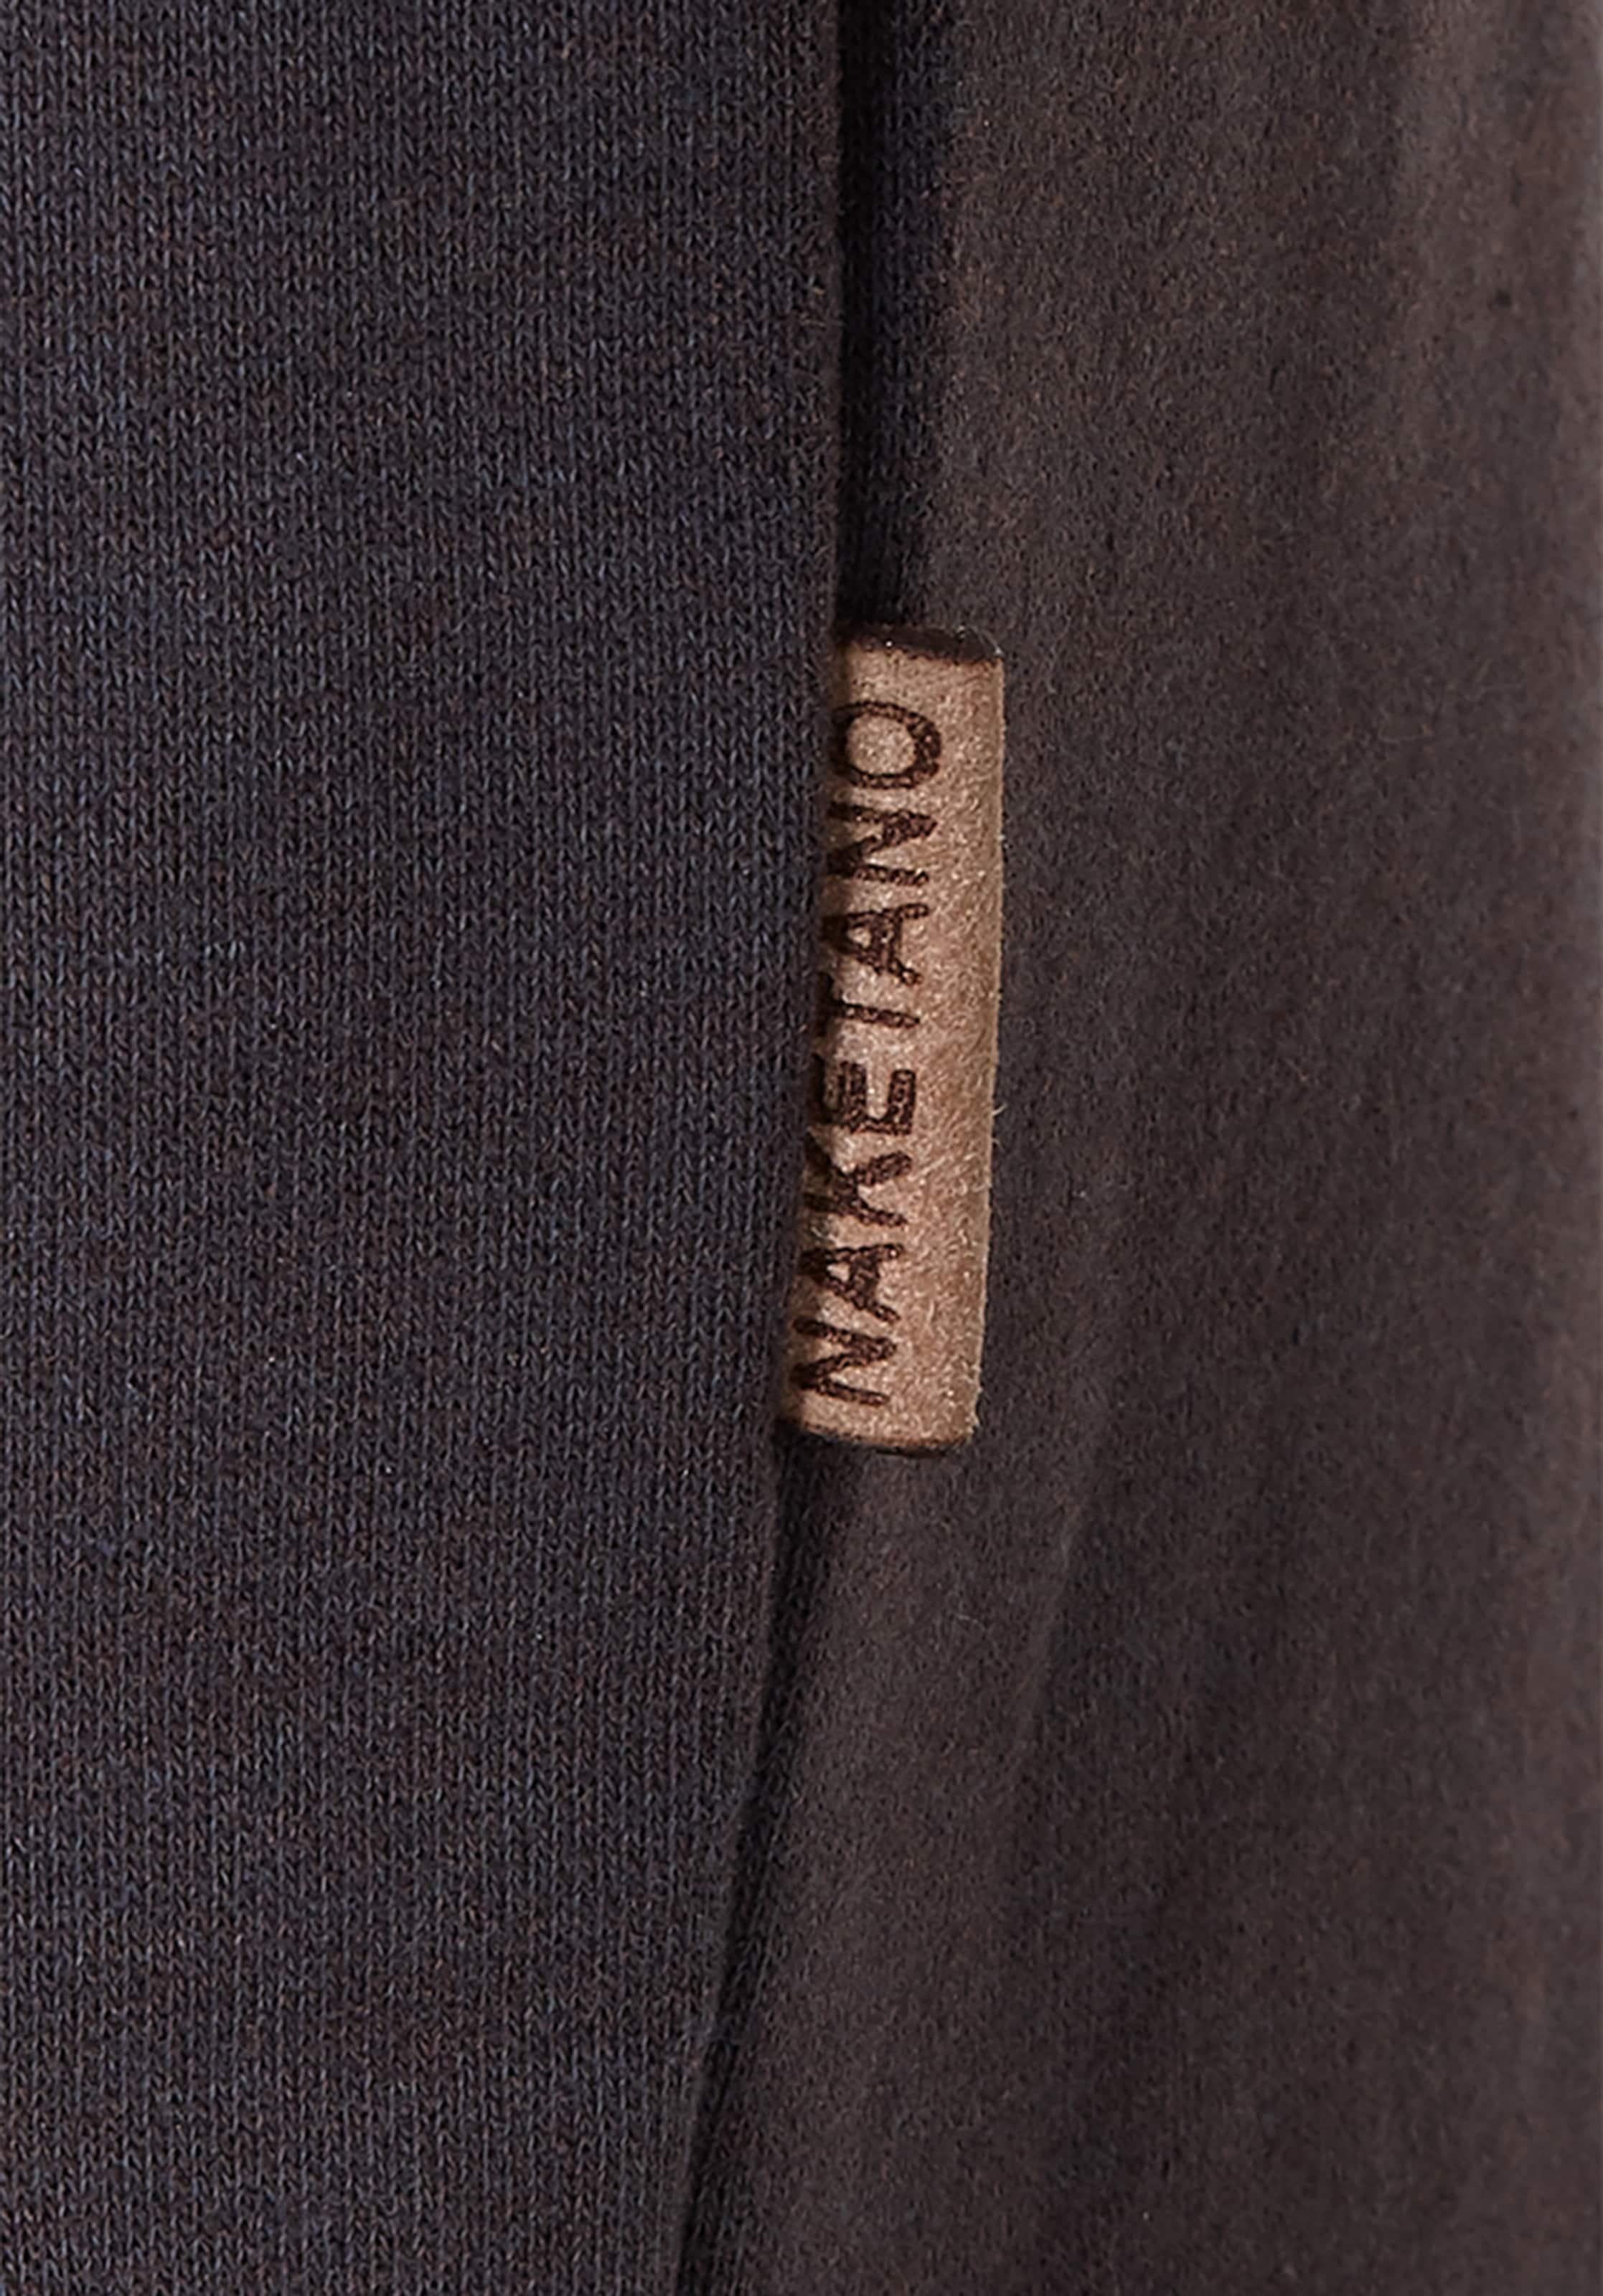 Mûre Naketano Sweat shirt shirt En Sweat Naketano 4qSc3Rj5AL